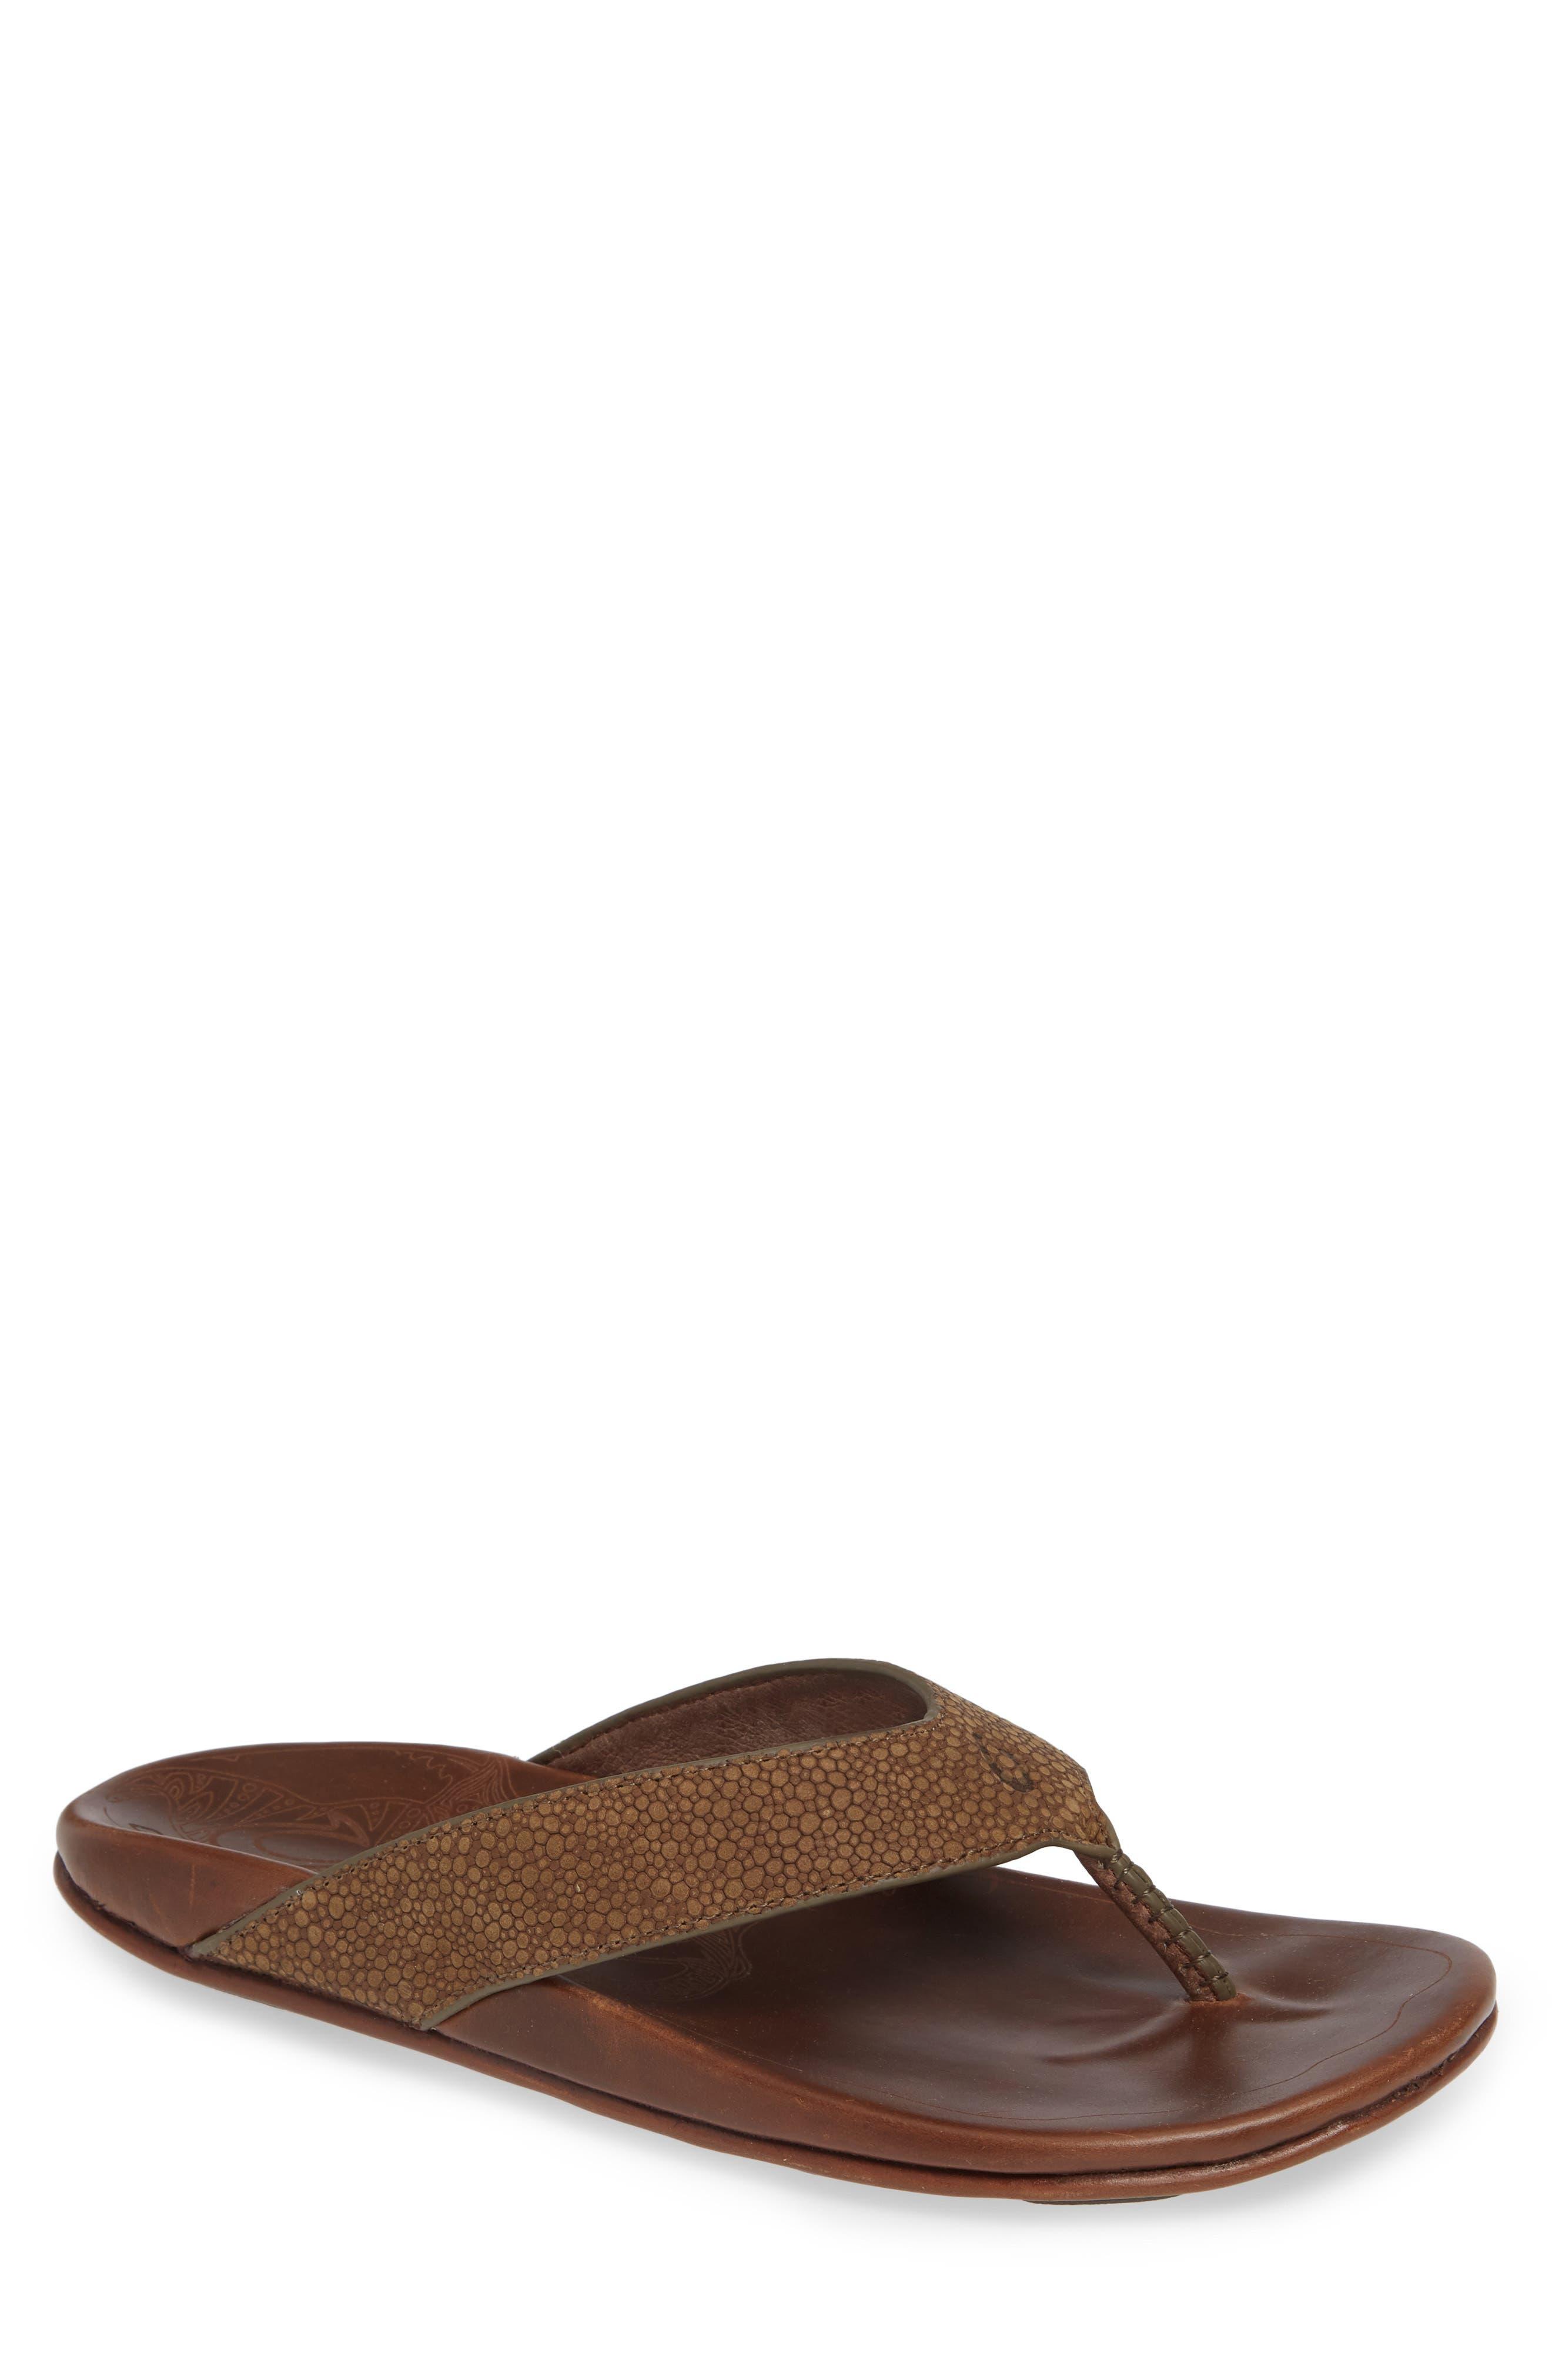 Kohana Kai Flip Flop,                         Main,                         color, MUSTANG/ TOFFEE